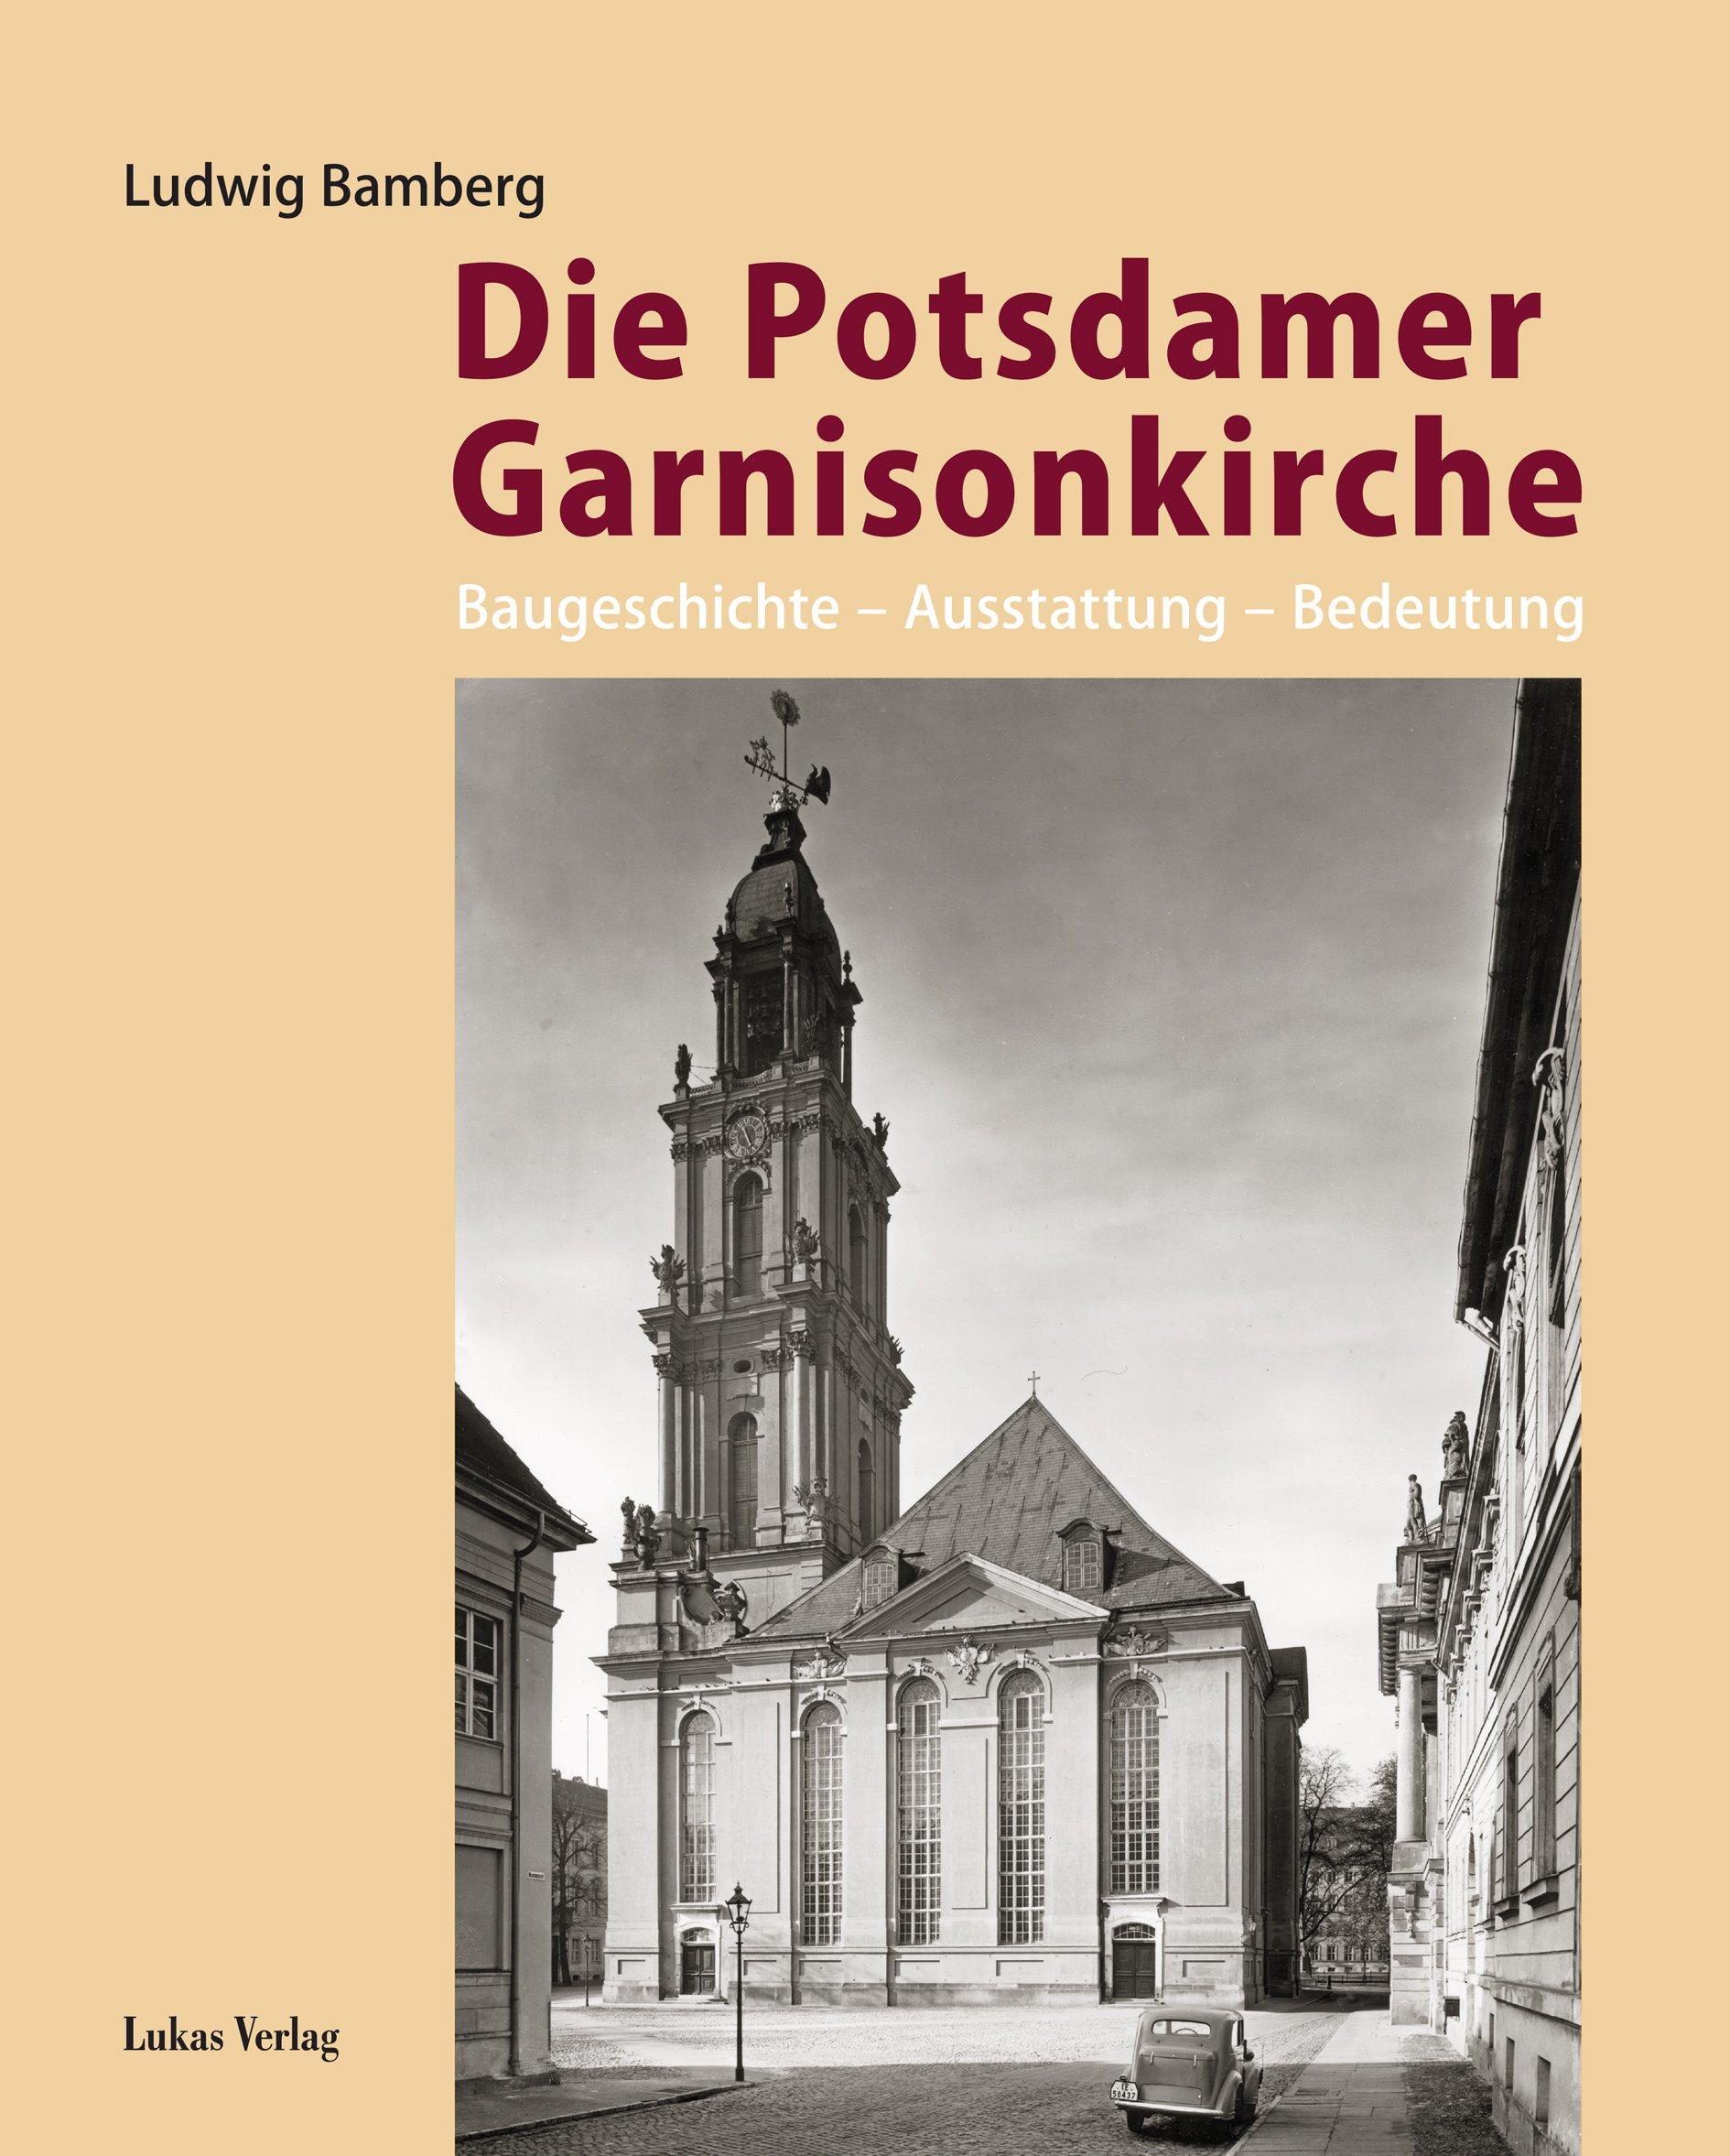 Die Potsdamer Garnisonkirche: Baugeschichte – Ausstattung – Bedeutung